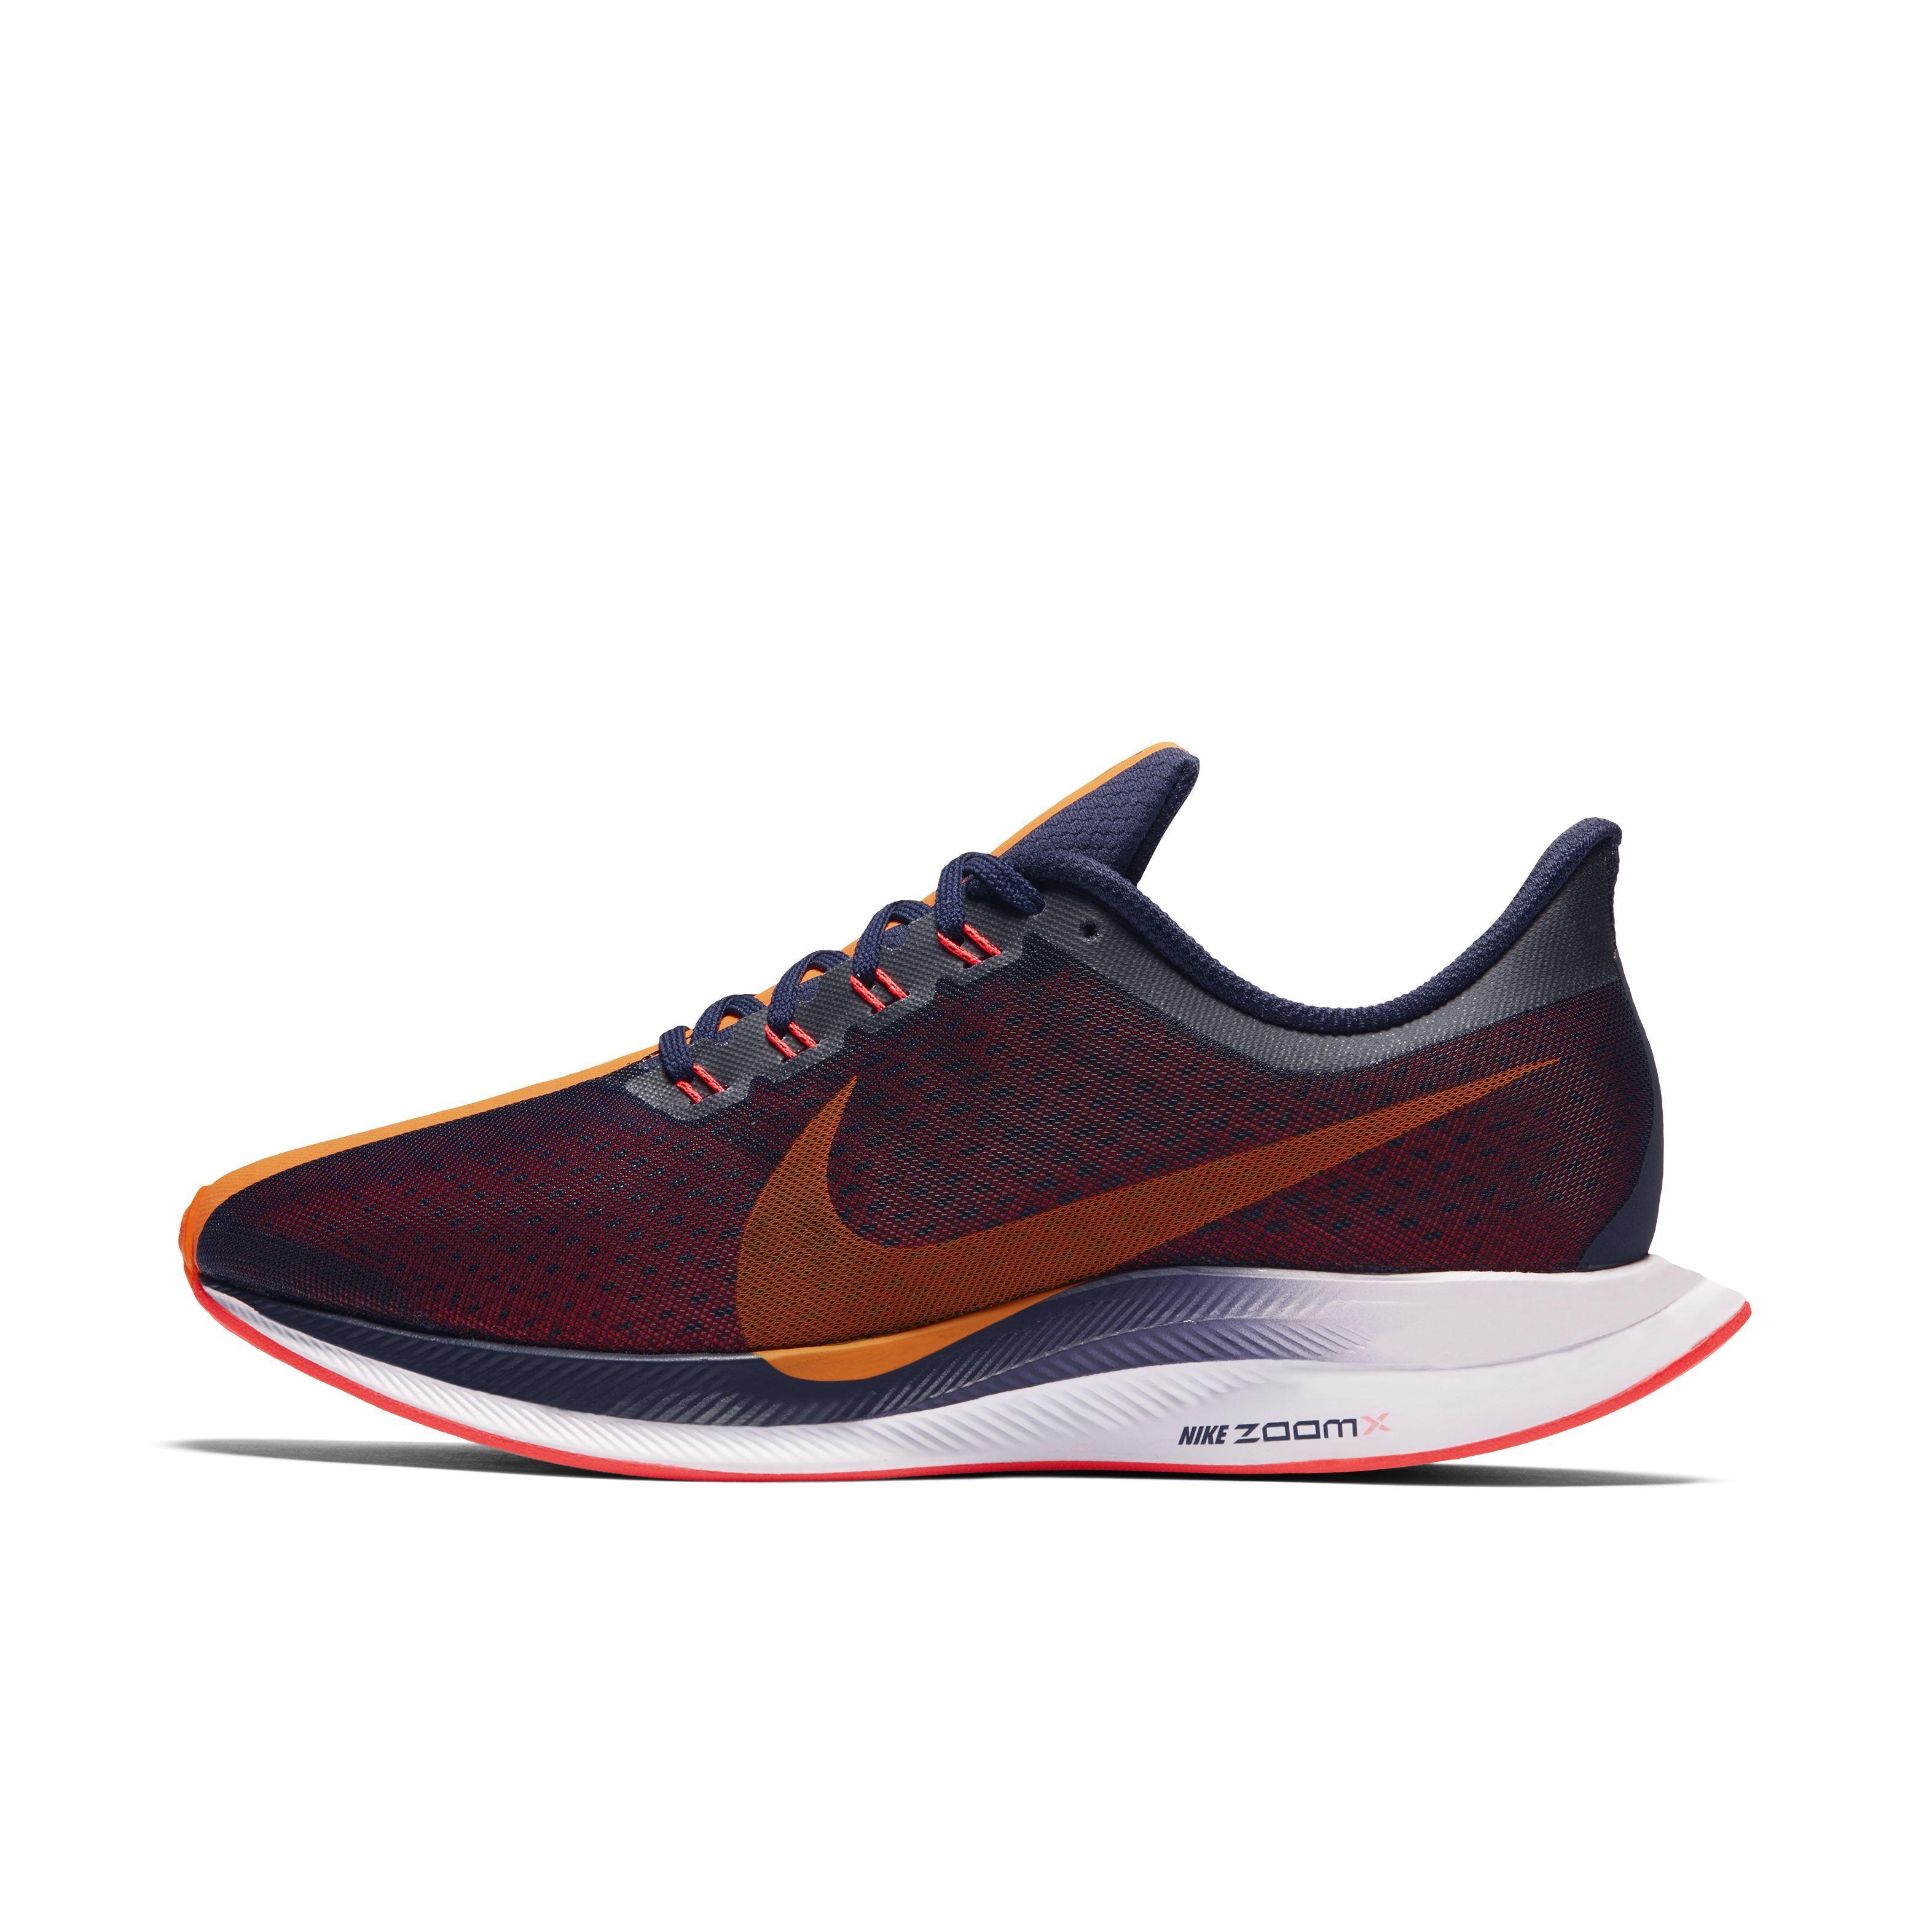 e8b65f06752bc Nike Shoe Sale — Deal on Nike Running Shoes April 2019